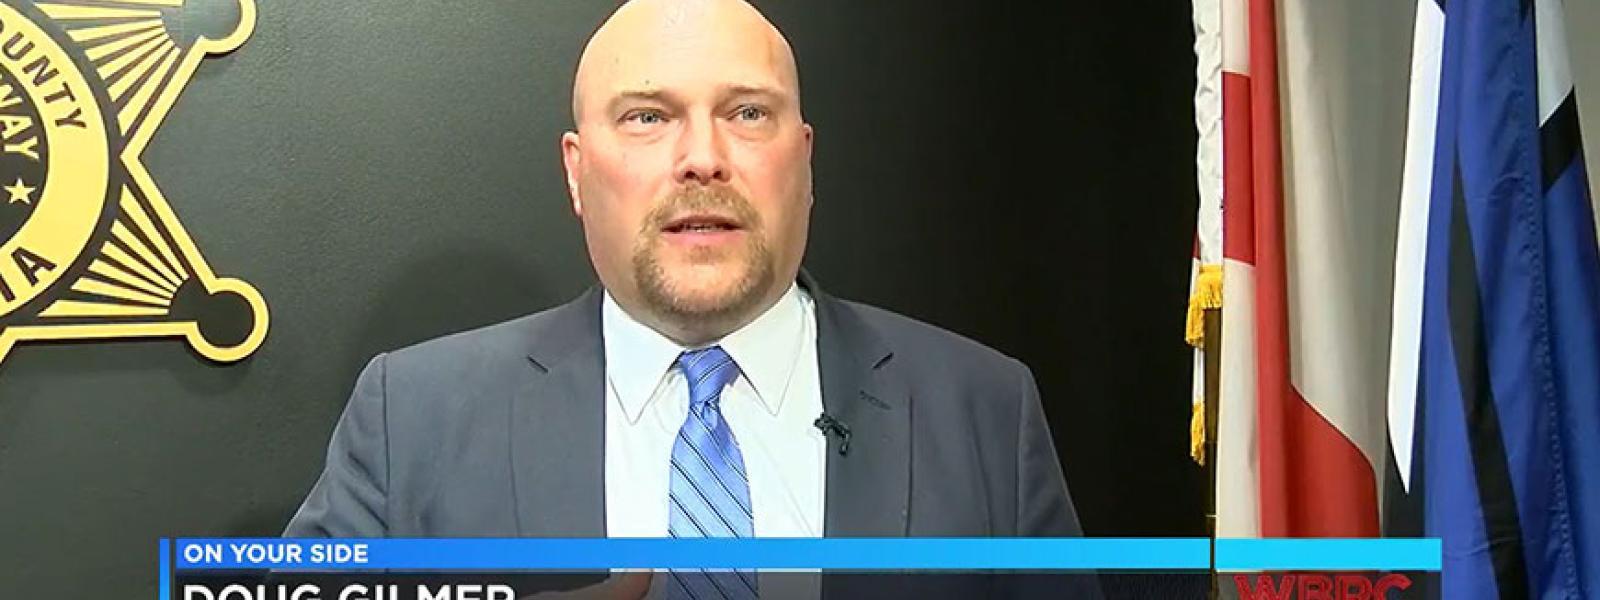 Doug Gilmer describes the fight against human trafficking on Birmingham, Alabama TV news. He is a CIU Ph.D. student.